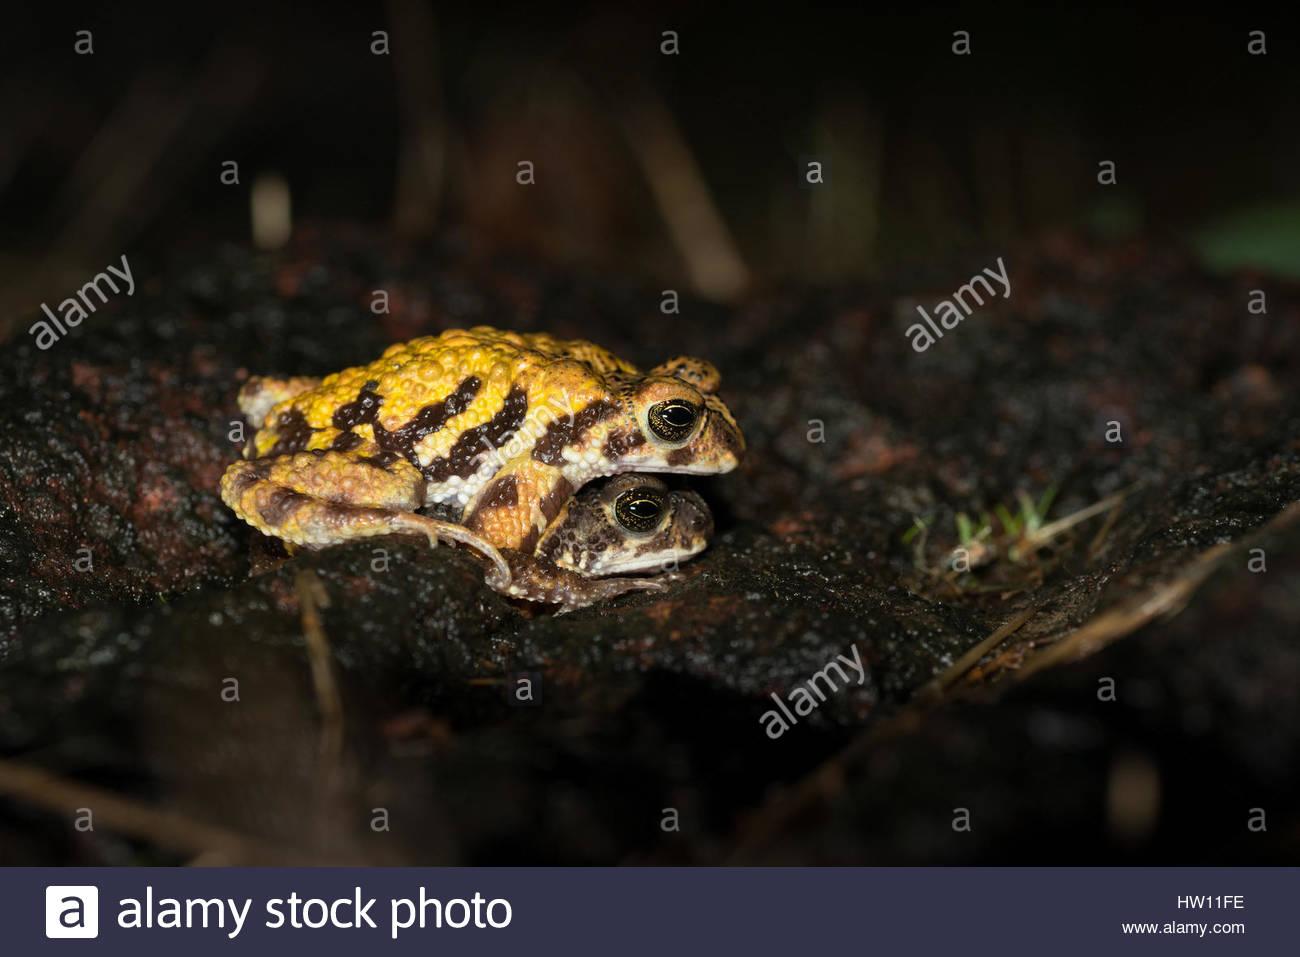 Tiger toads, Xanthophryne tigerina, mating. - Stock Image